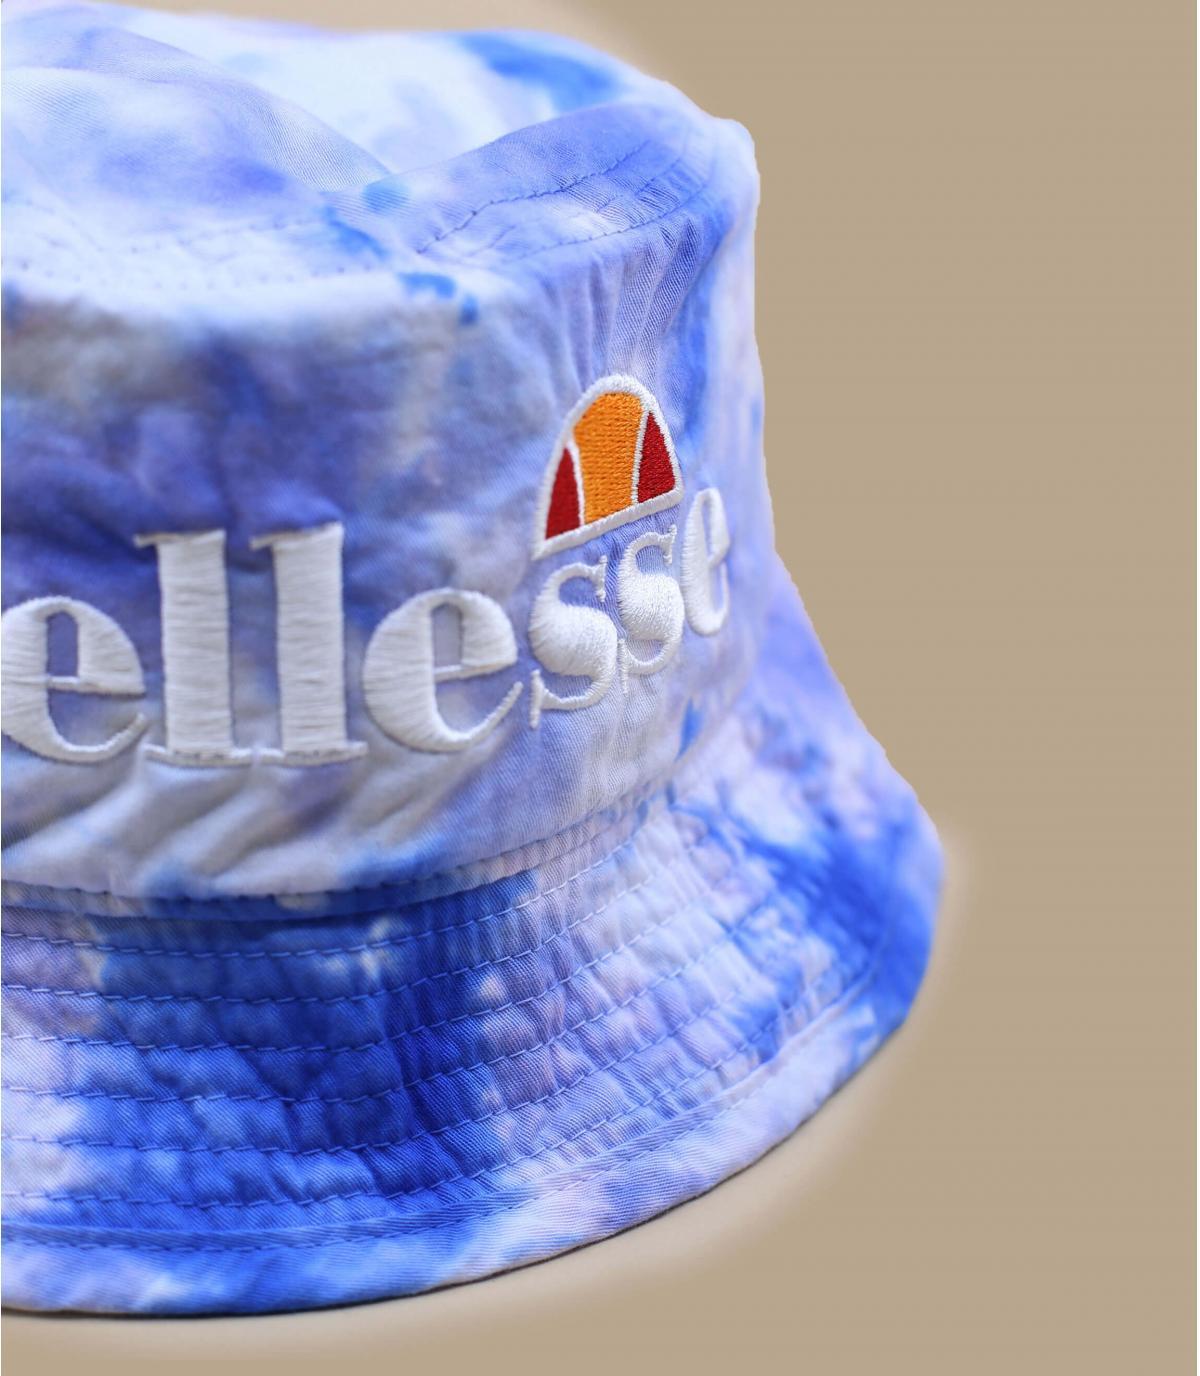 Detalles Hallan Tie Dye blue imagen 2